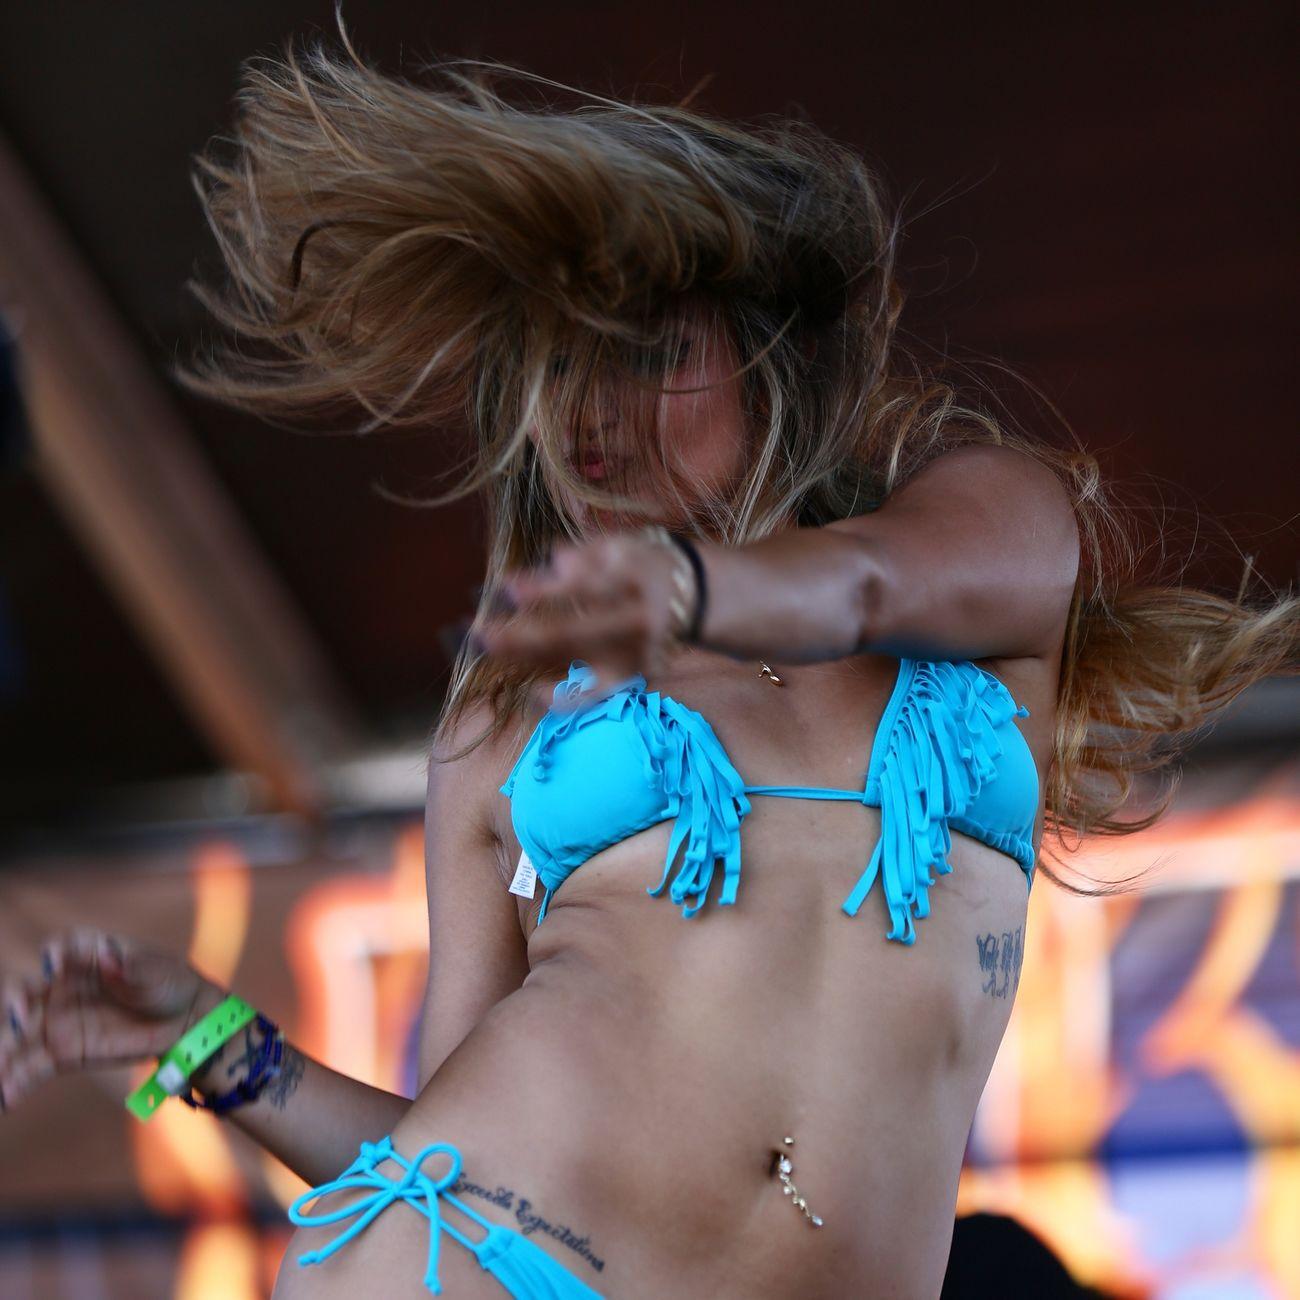 Bikinicontest Austin Texas Texasheatwave2014 Bikini